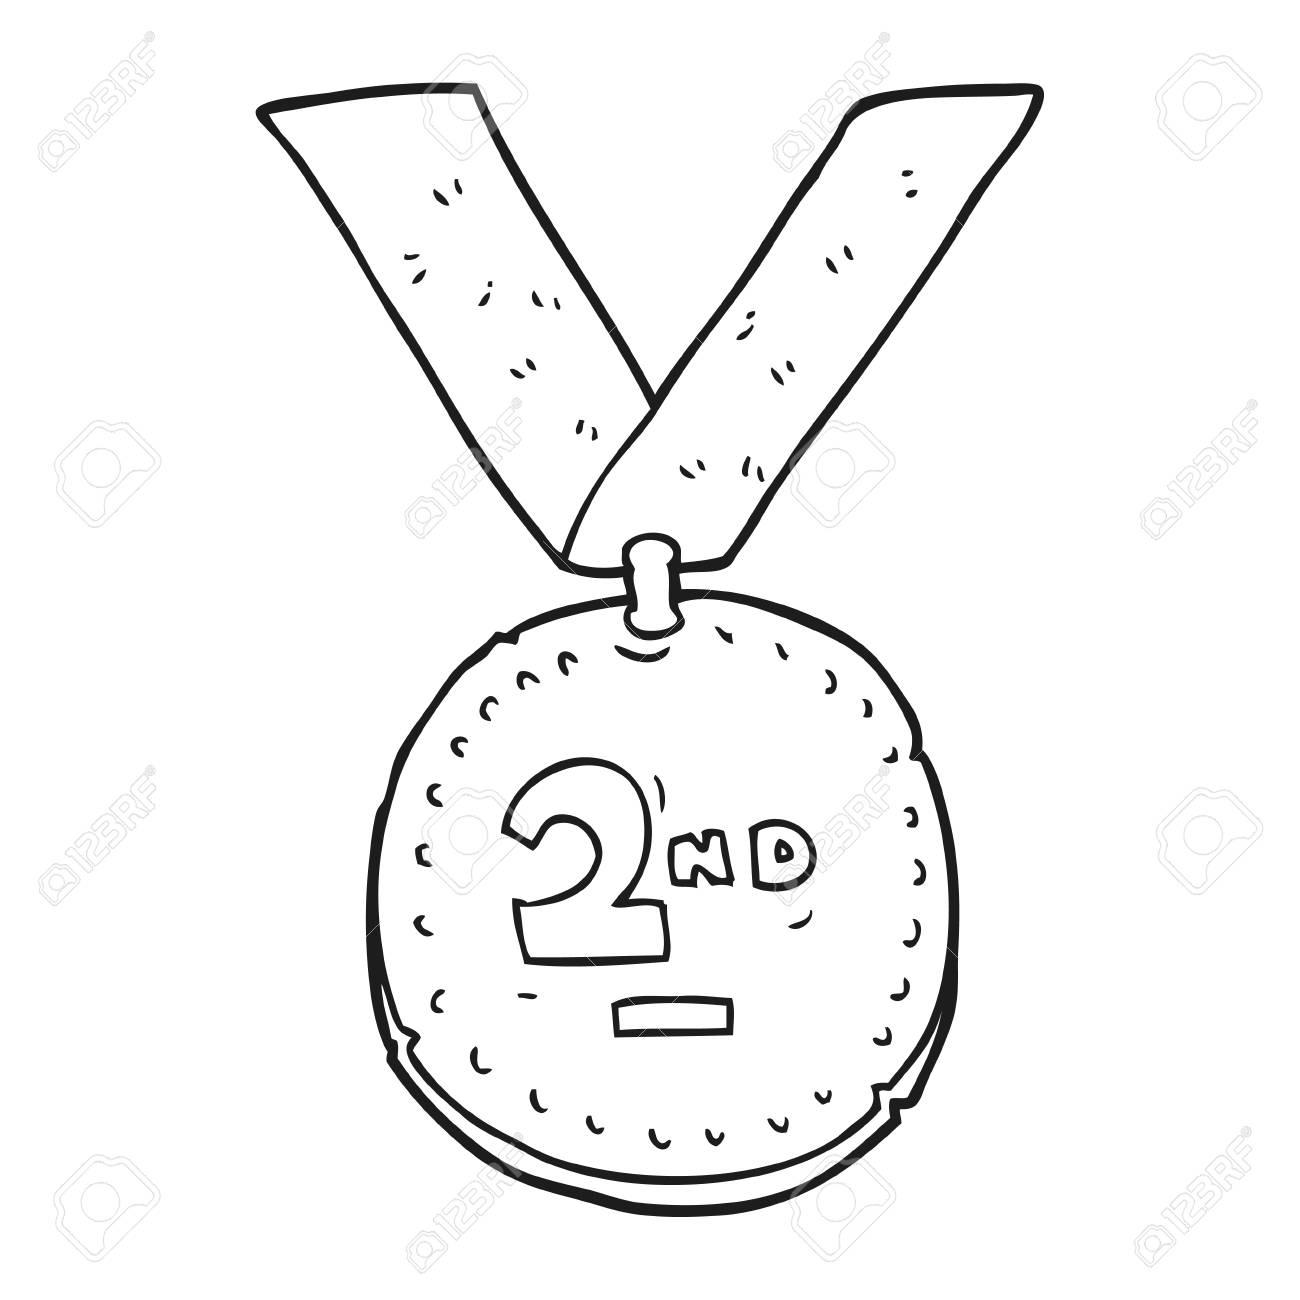 Freehand drawn black and white cartoon sports medal royalty free 53192135 freehand drawn black and white